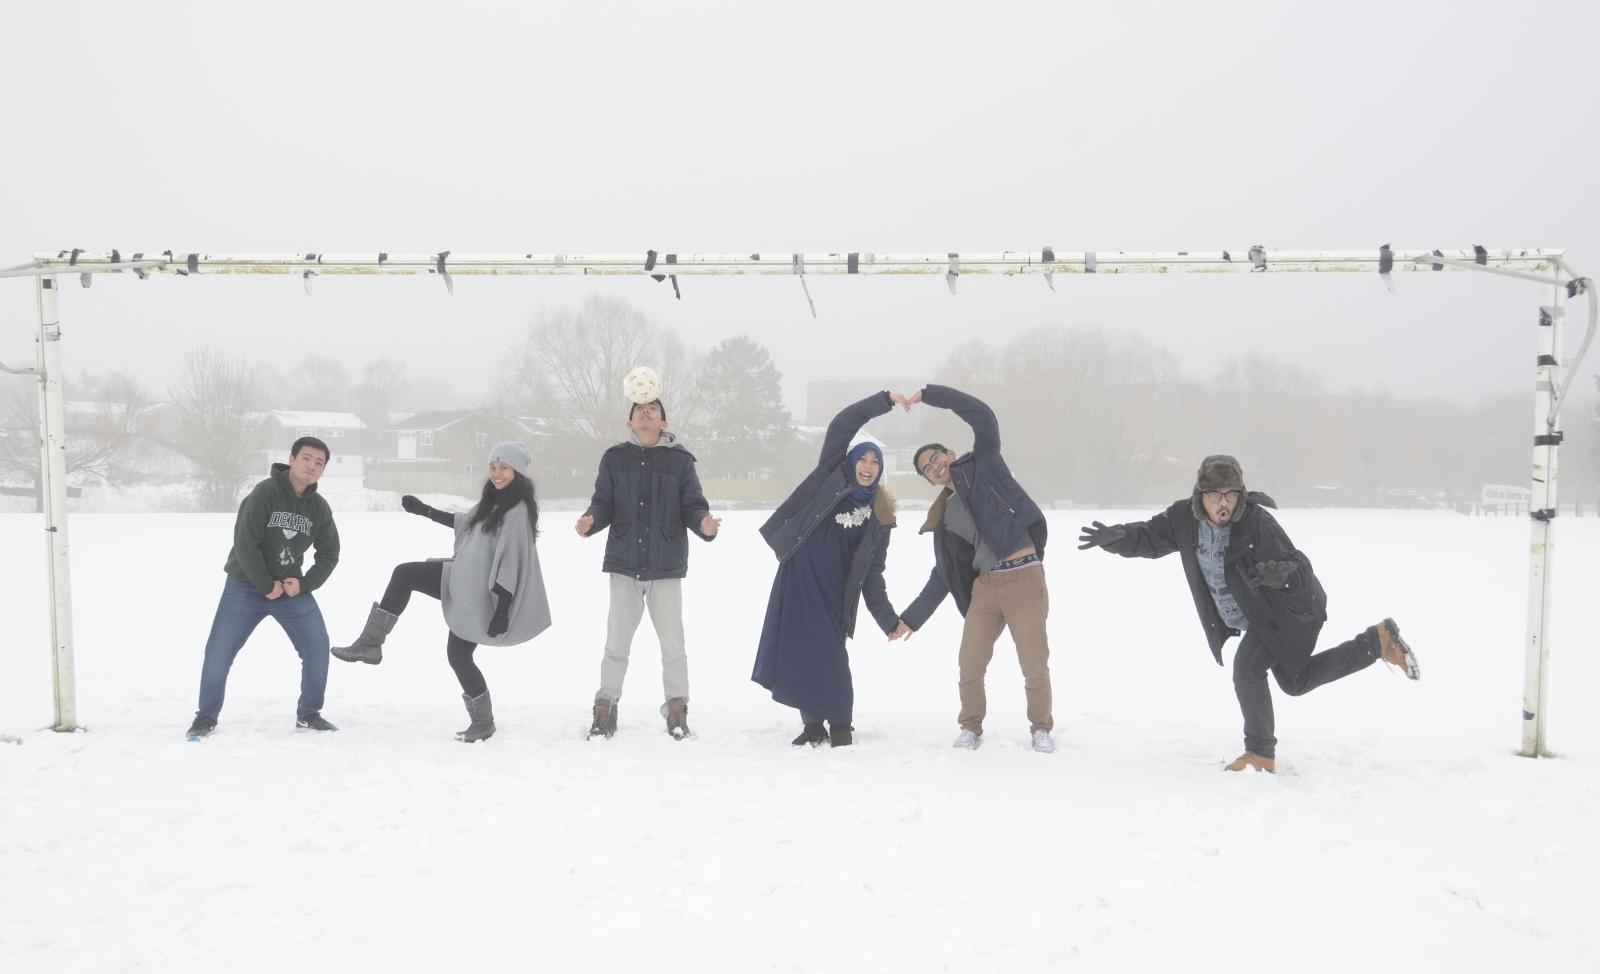 Snow in Cranfield